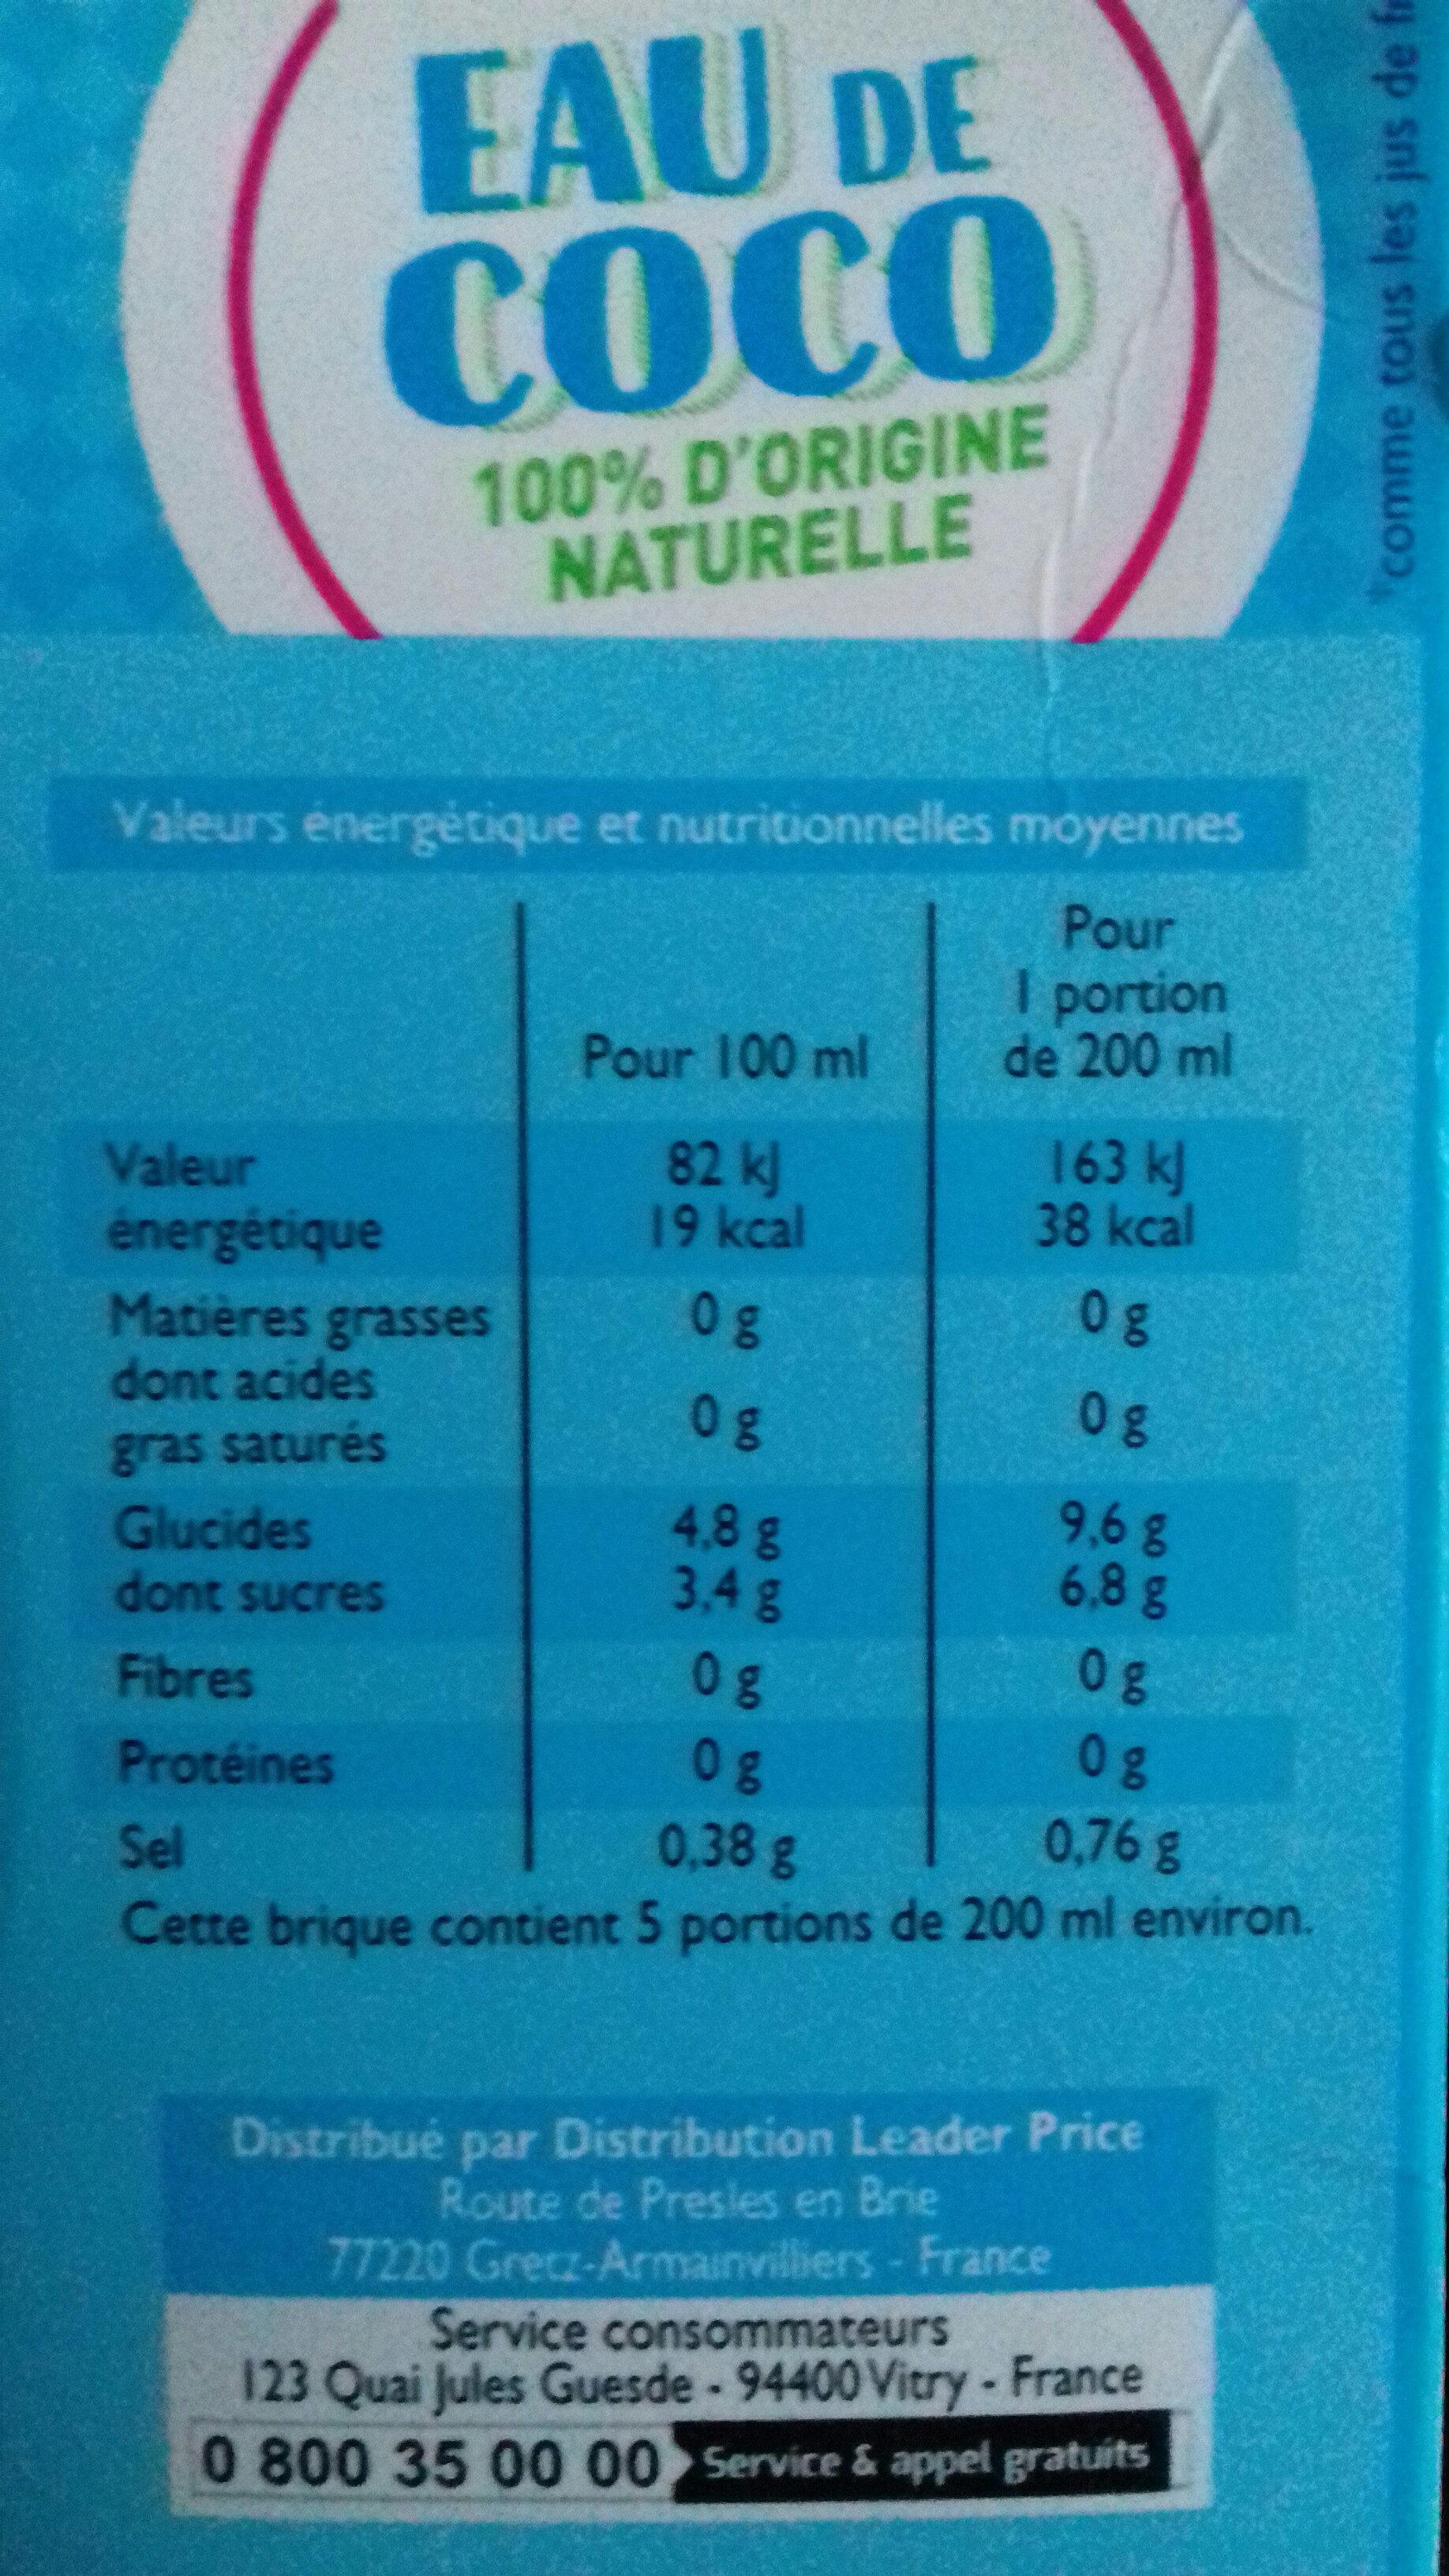 Eau de coco 100% d'origine naturelle - Valori nutrizionali - fr